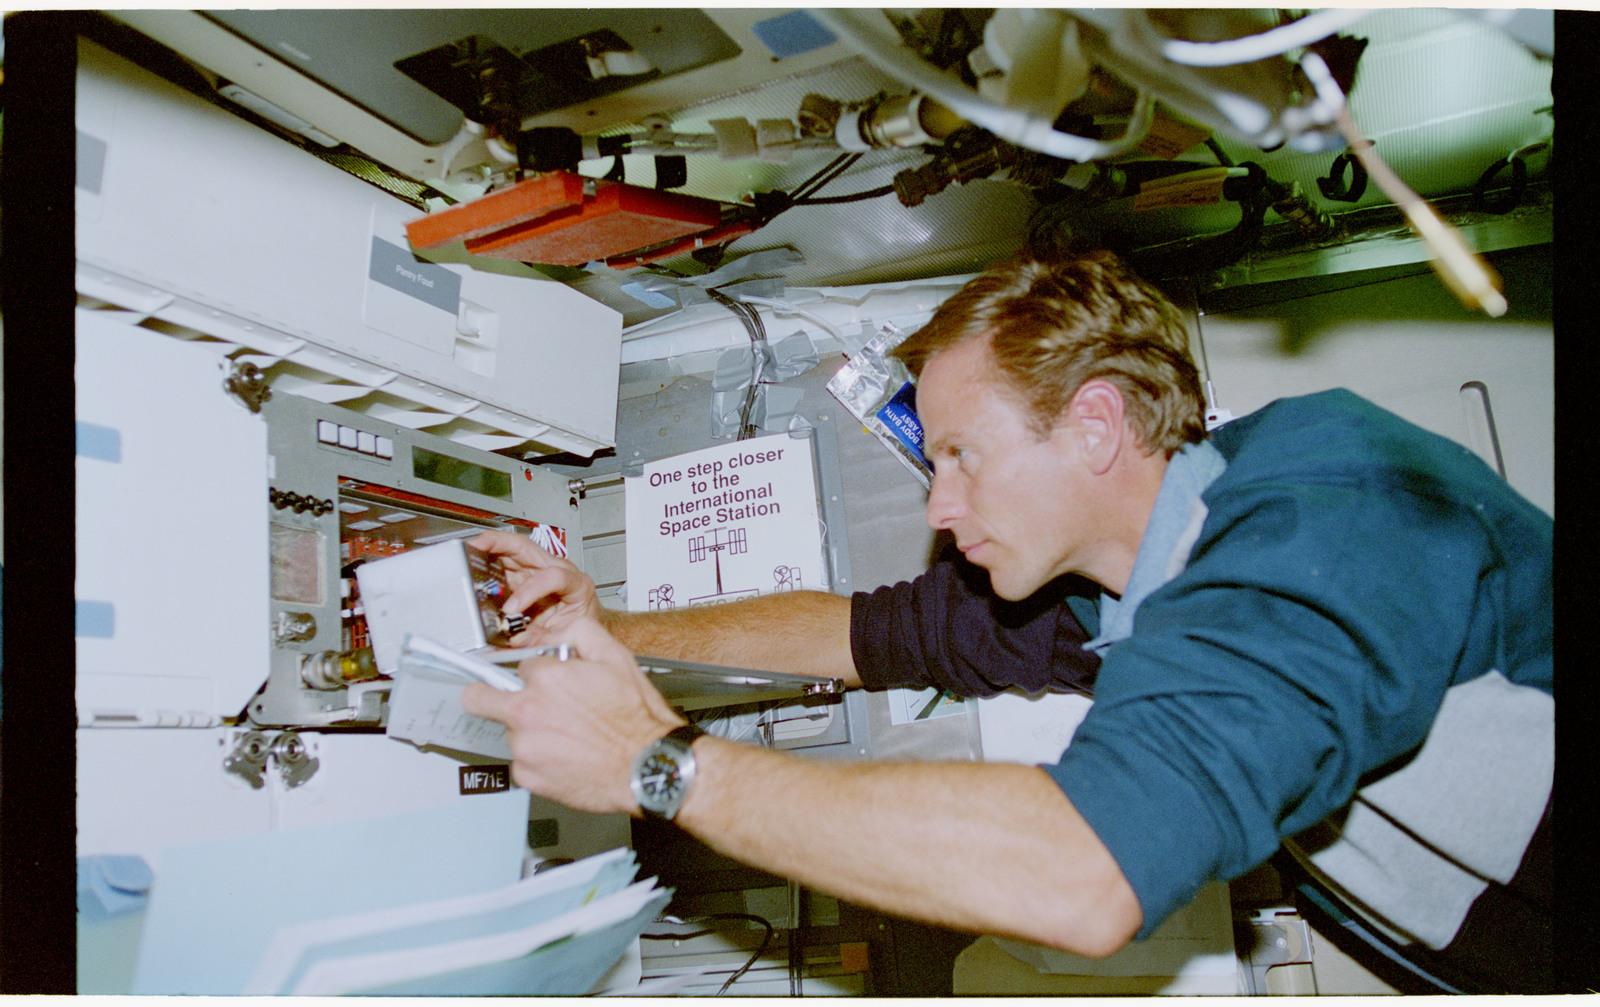 STS069-377-022 - STS-069 - CMIX-04